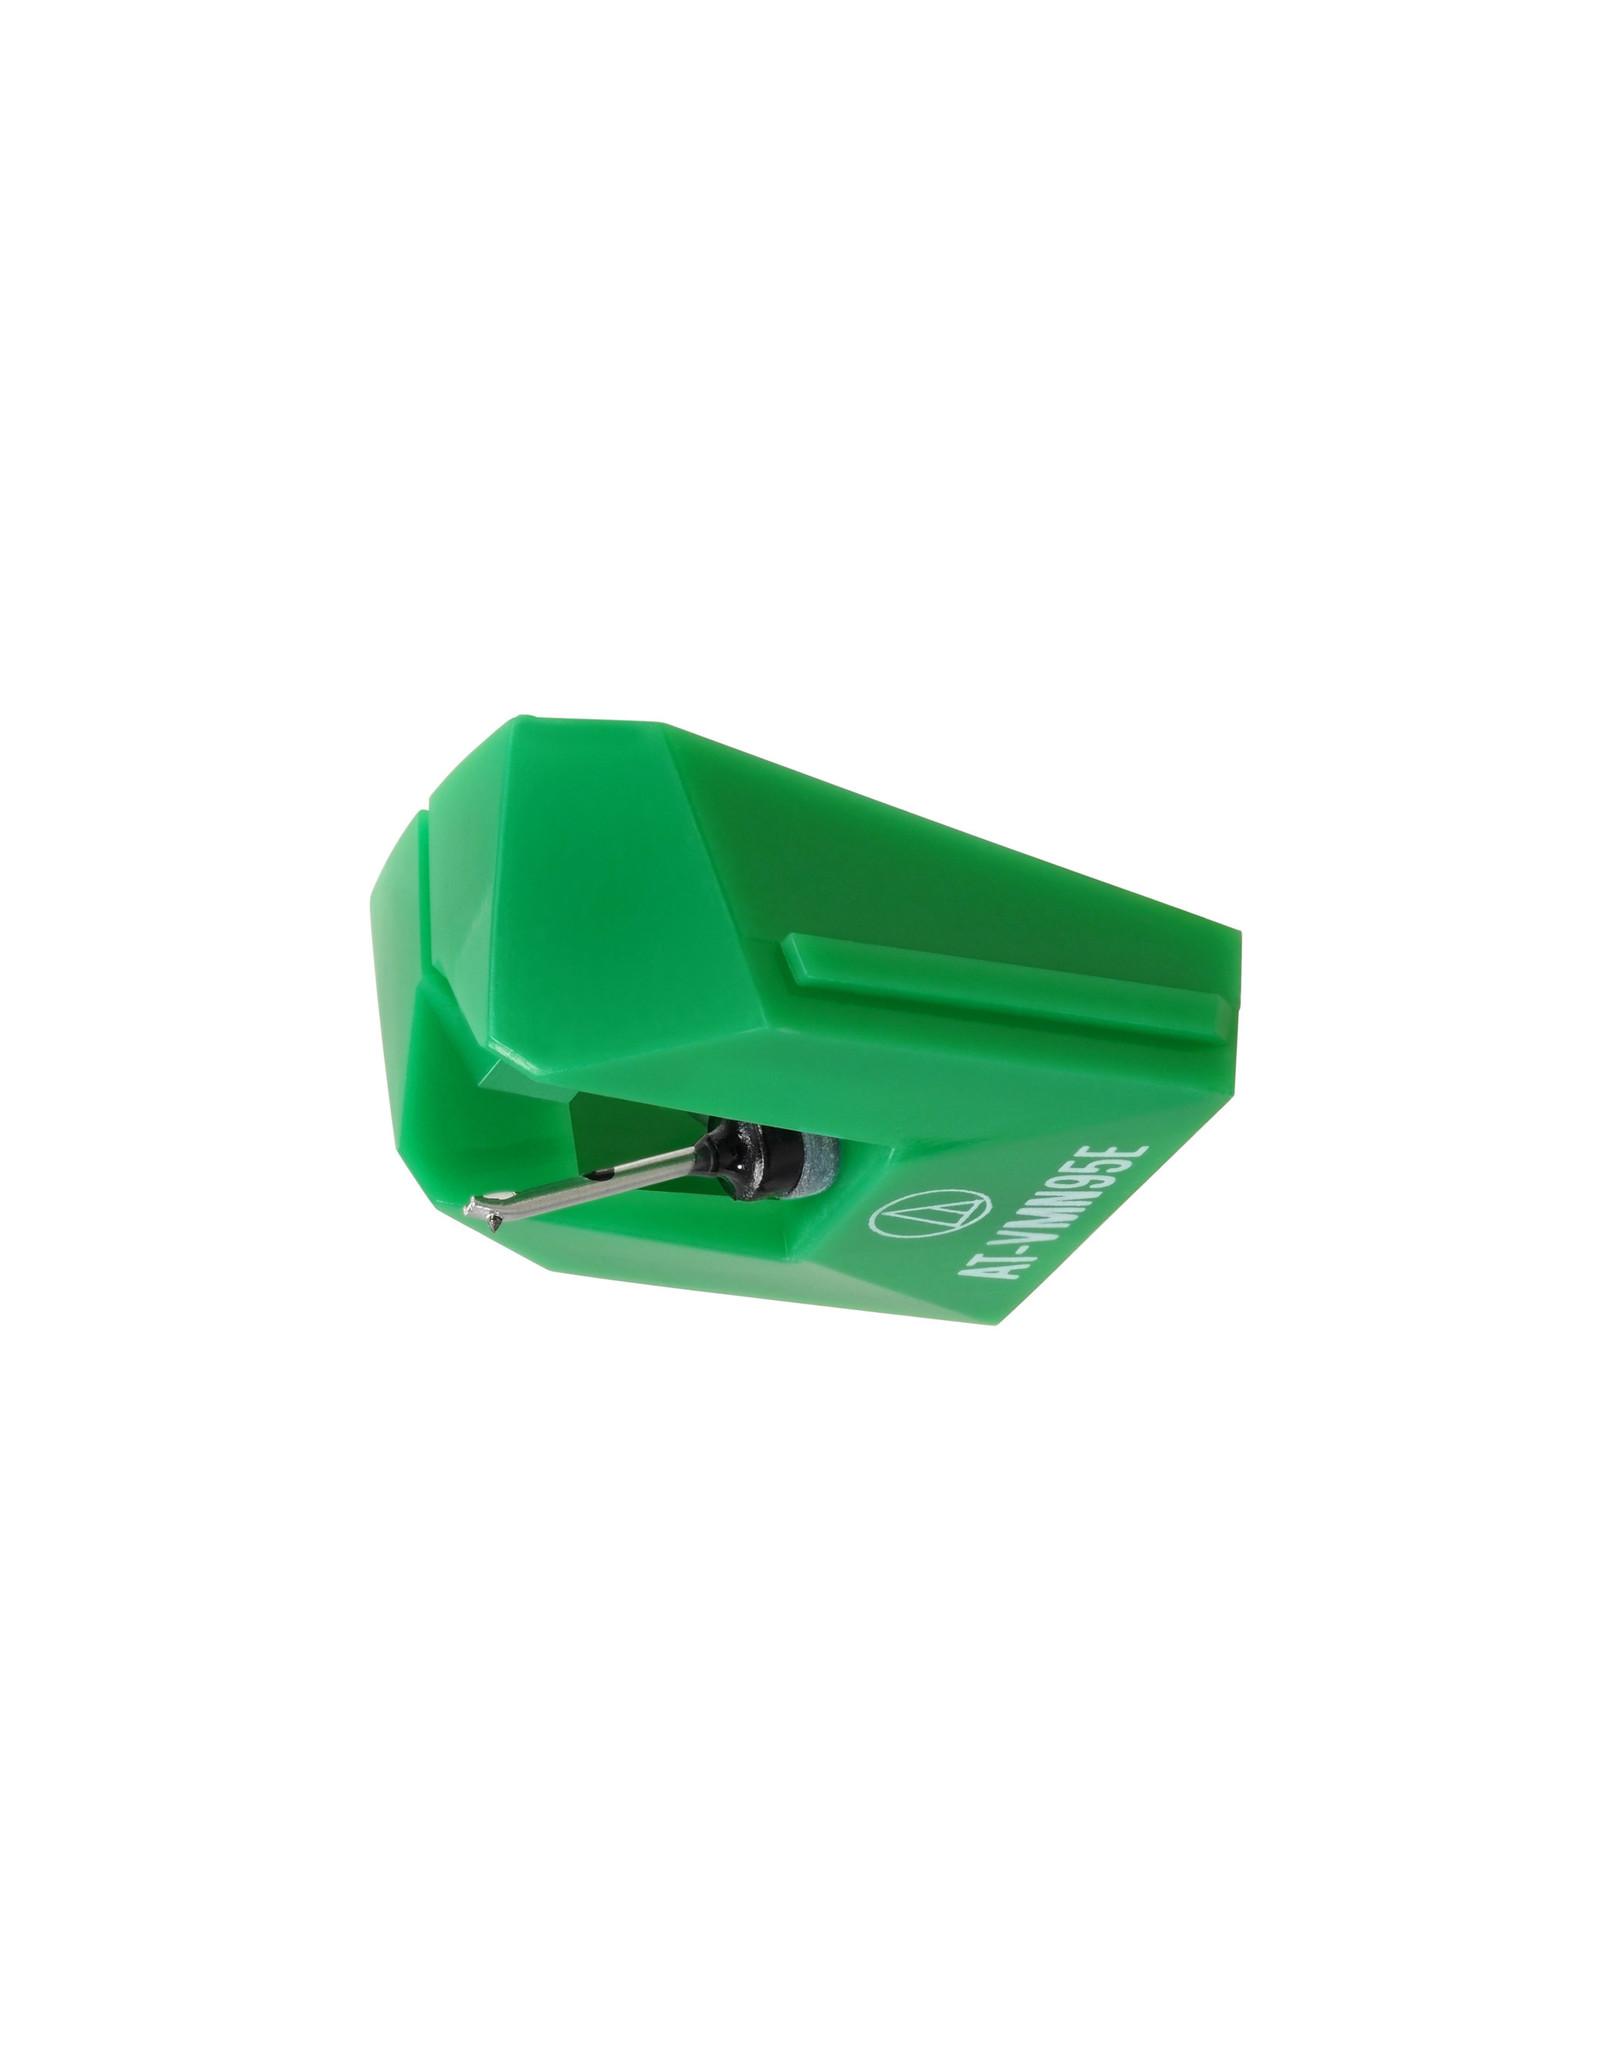 Audio-Technica Audio-Technica AT-VMN95E Phono Stylus